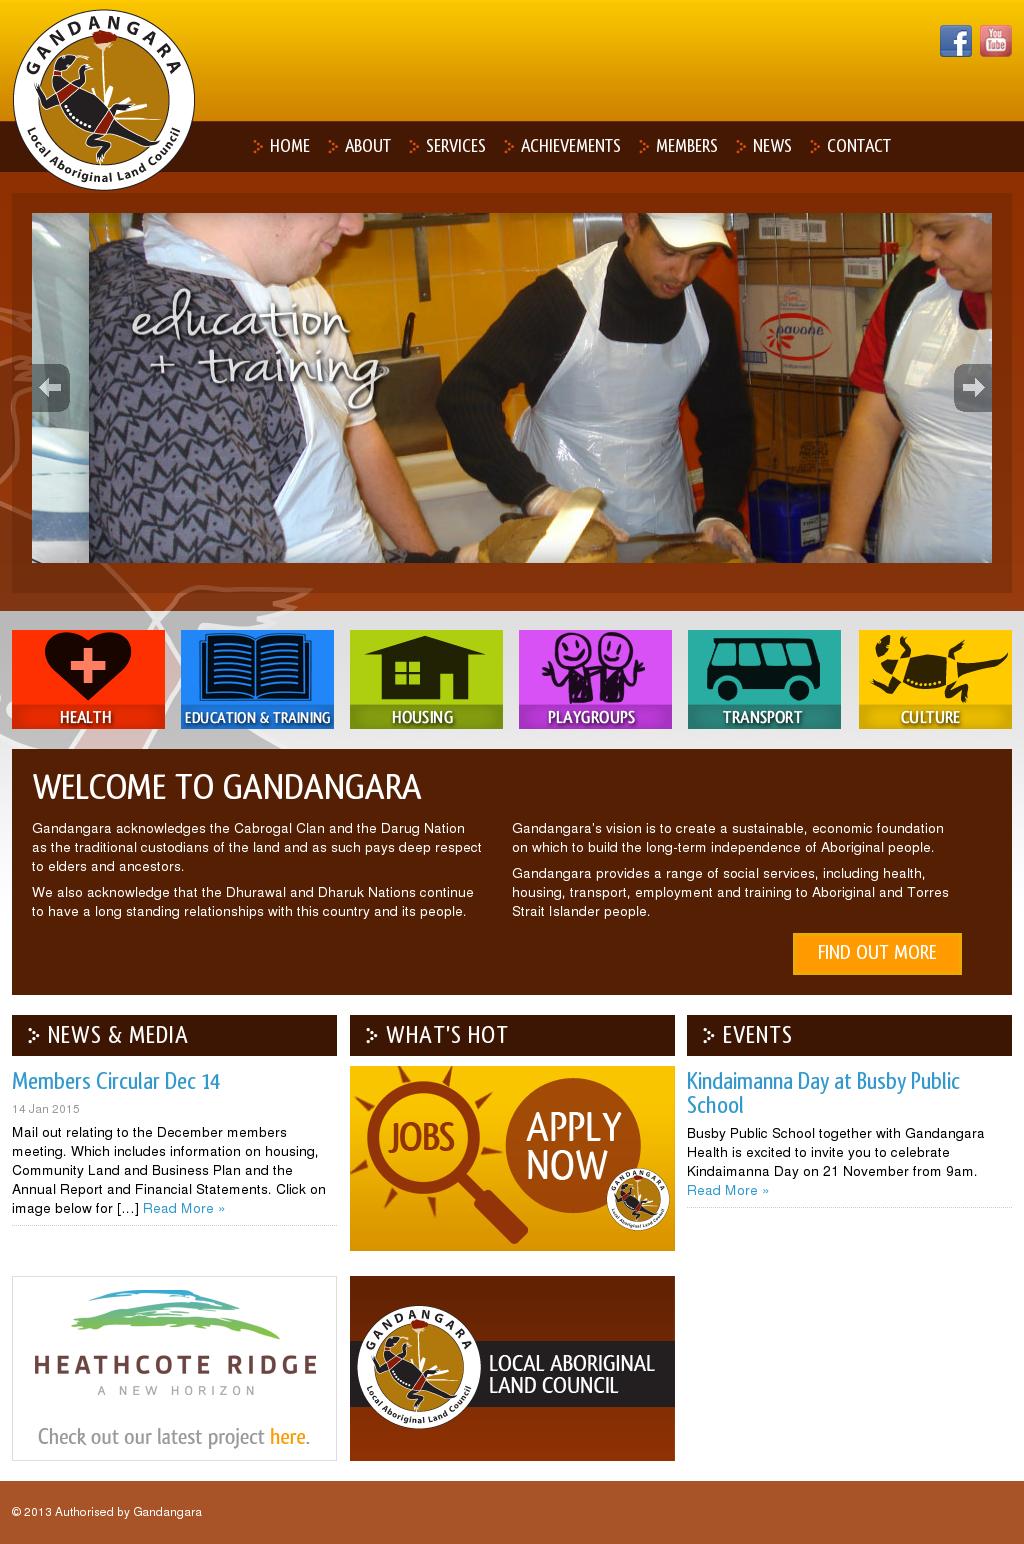 Gandangara Local Aboriginal Land Council Competitors